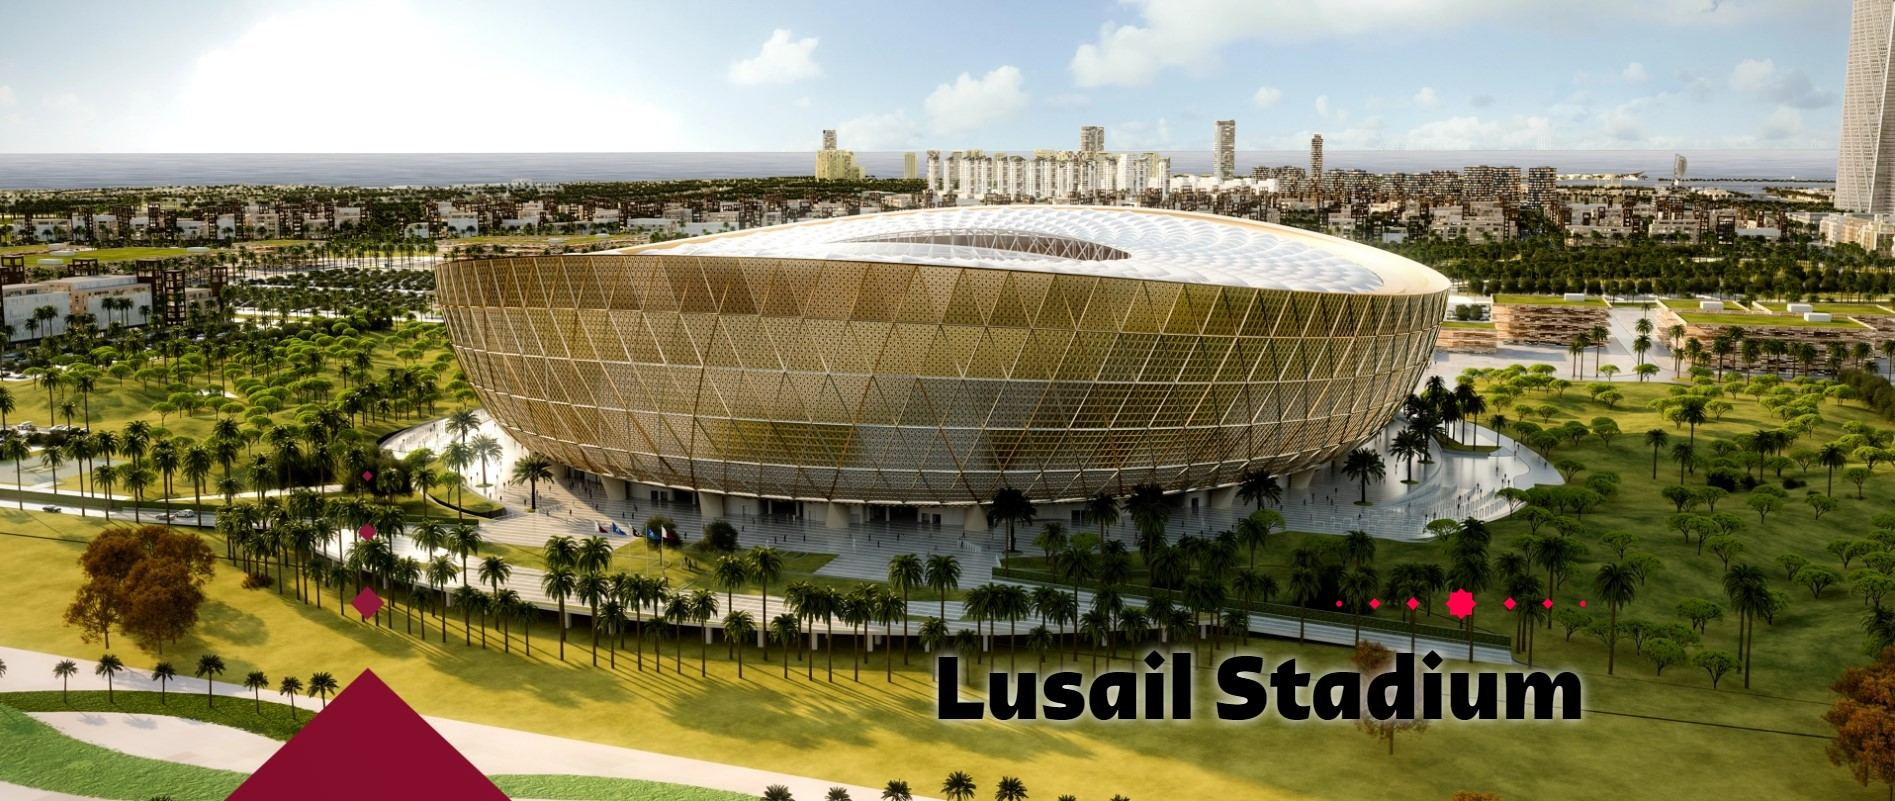 Lusail Stadium.jpg